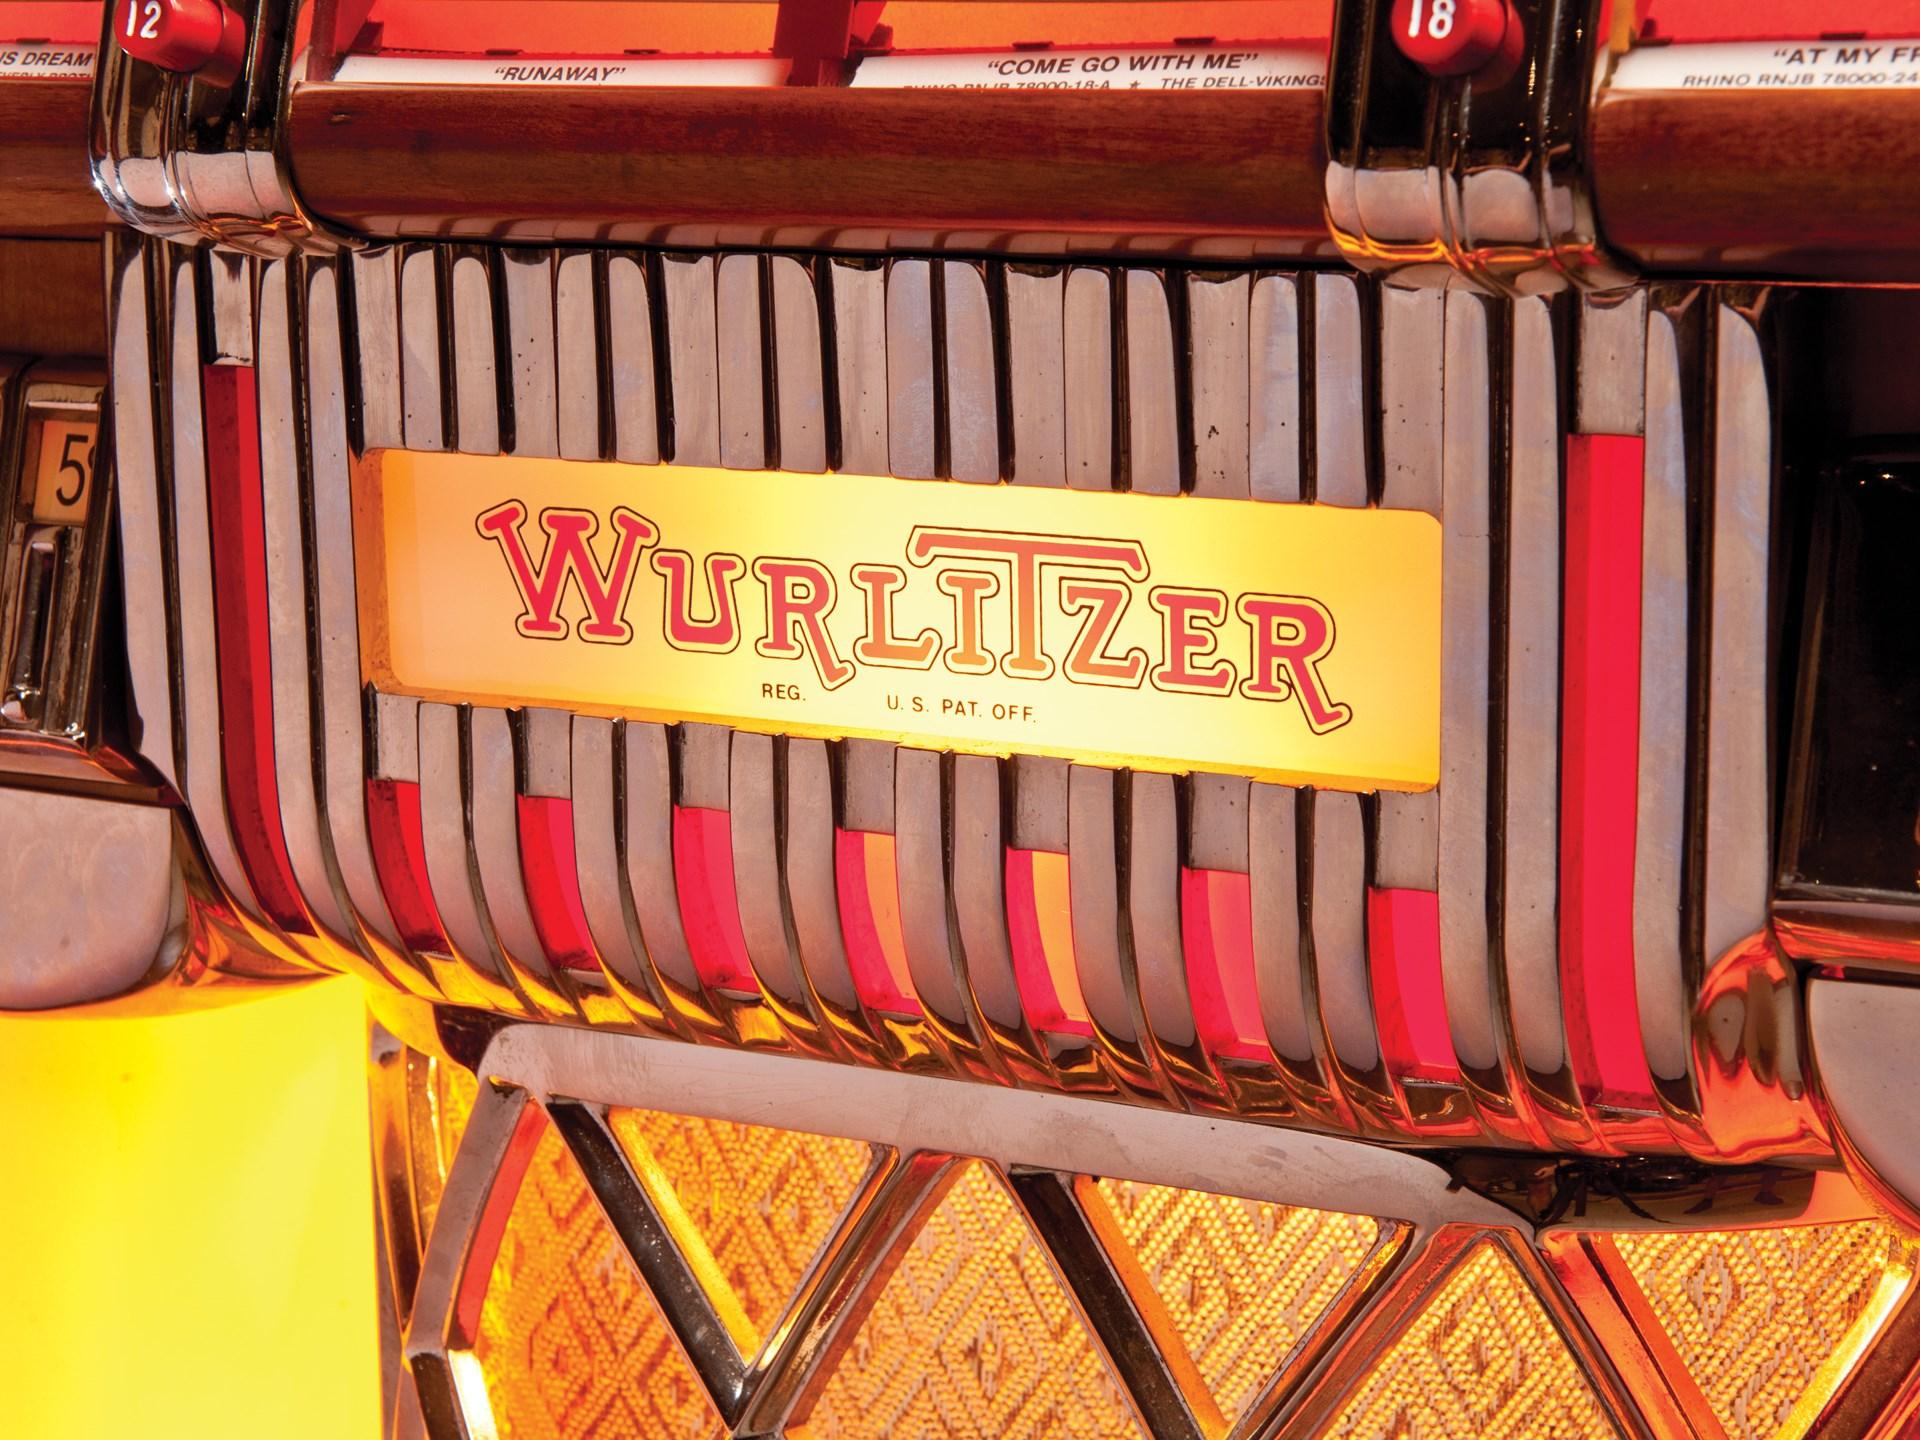 RM Sotheby's - Wurlitzer 1015